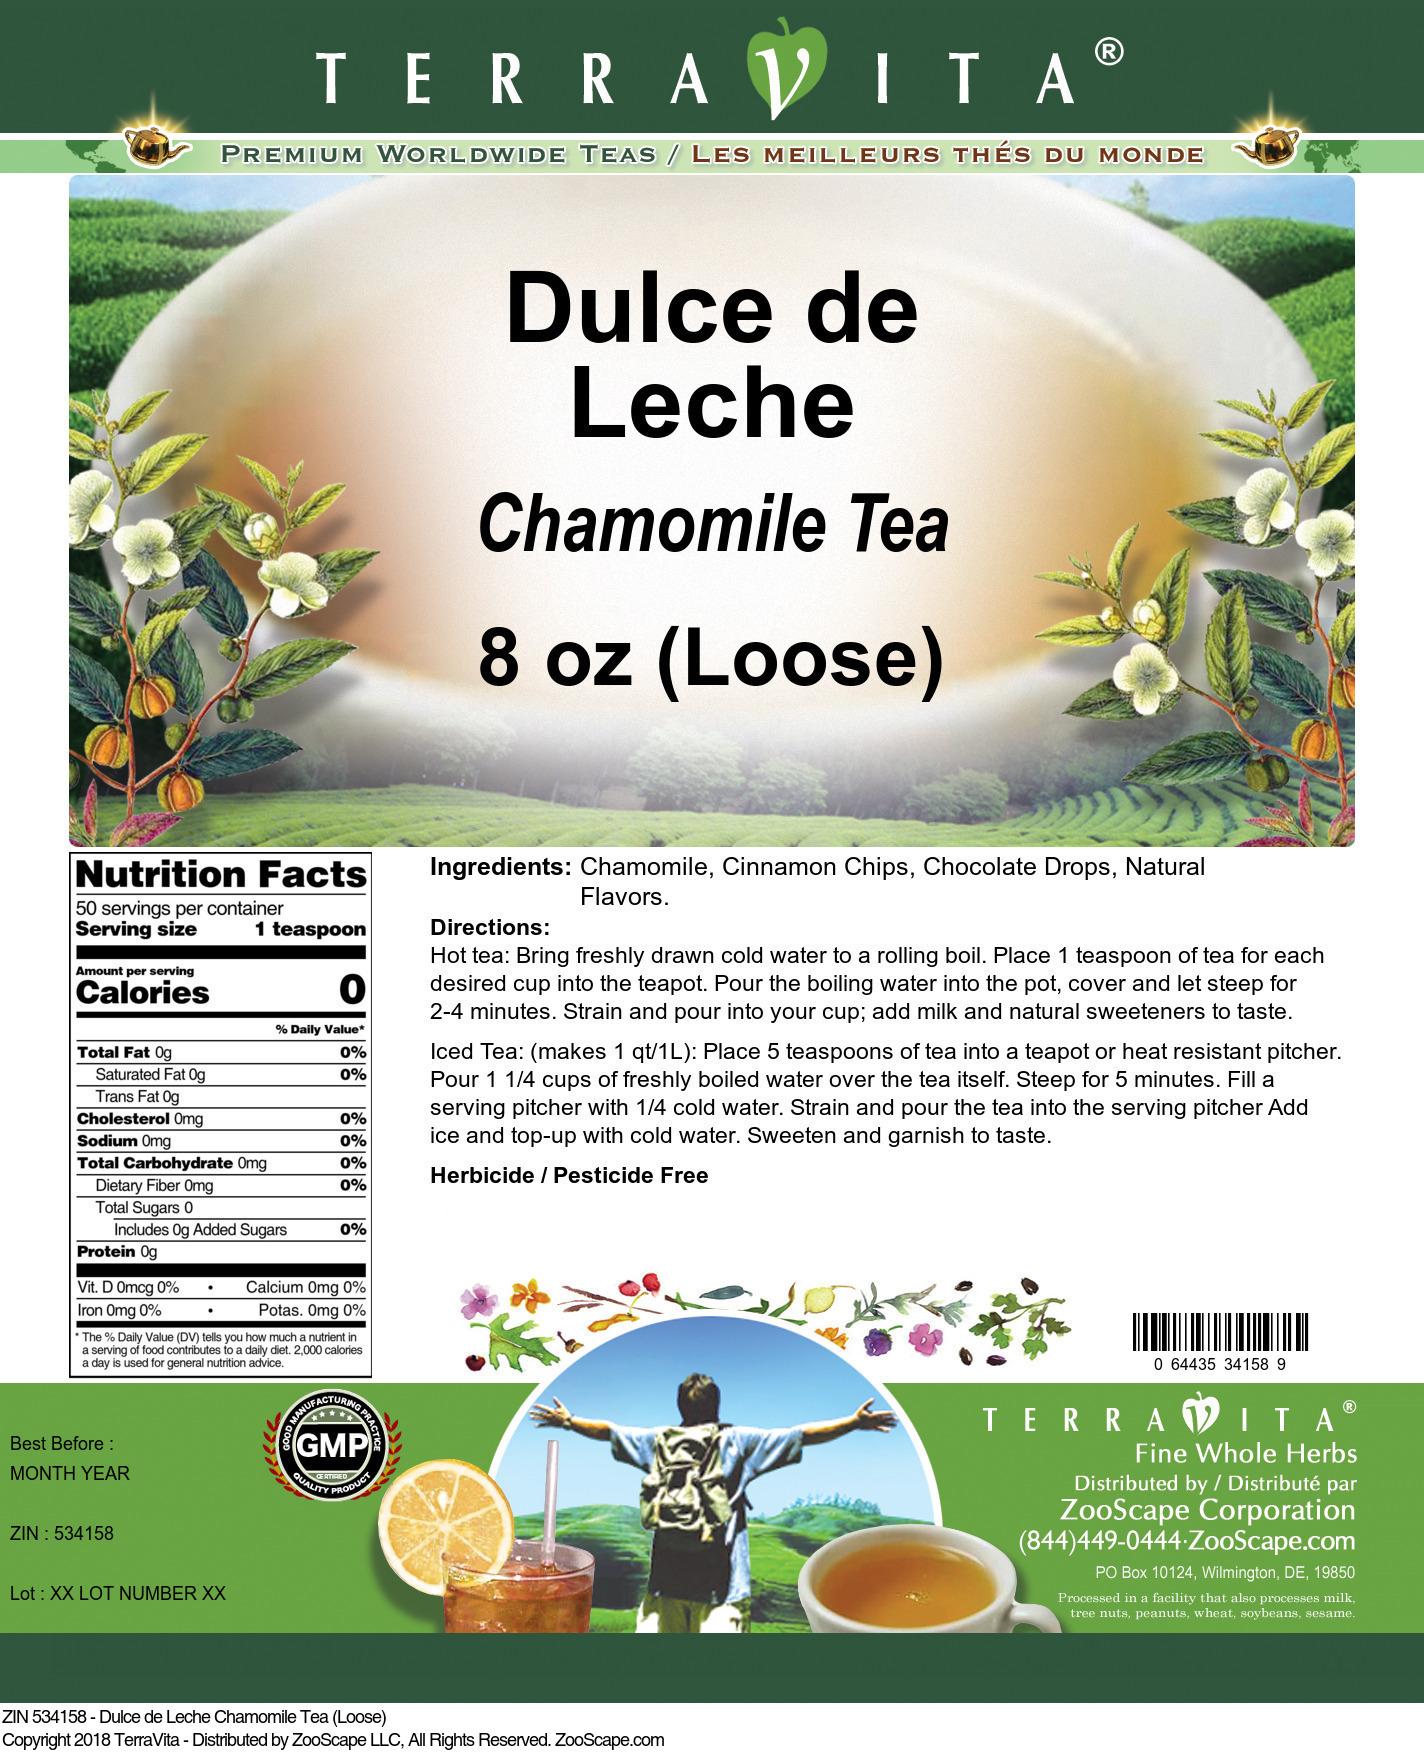 Dulce de Leche Chamomile Tea